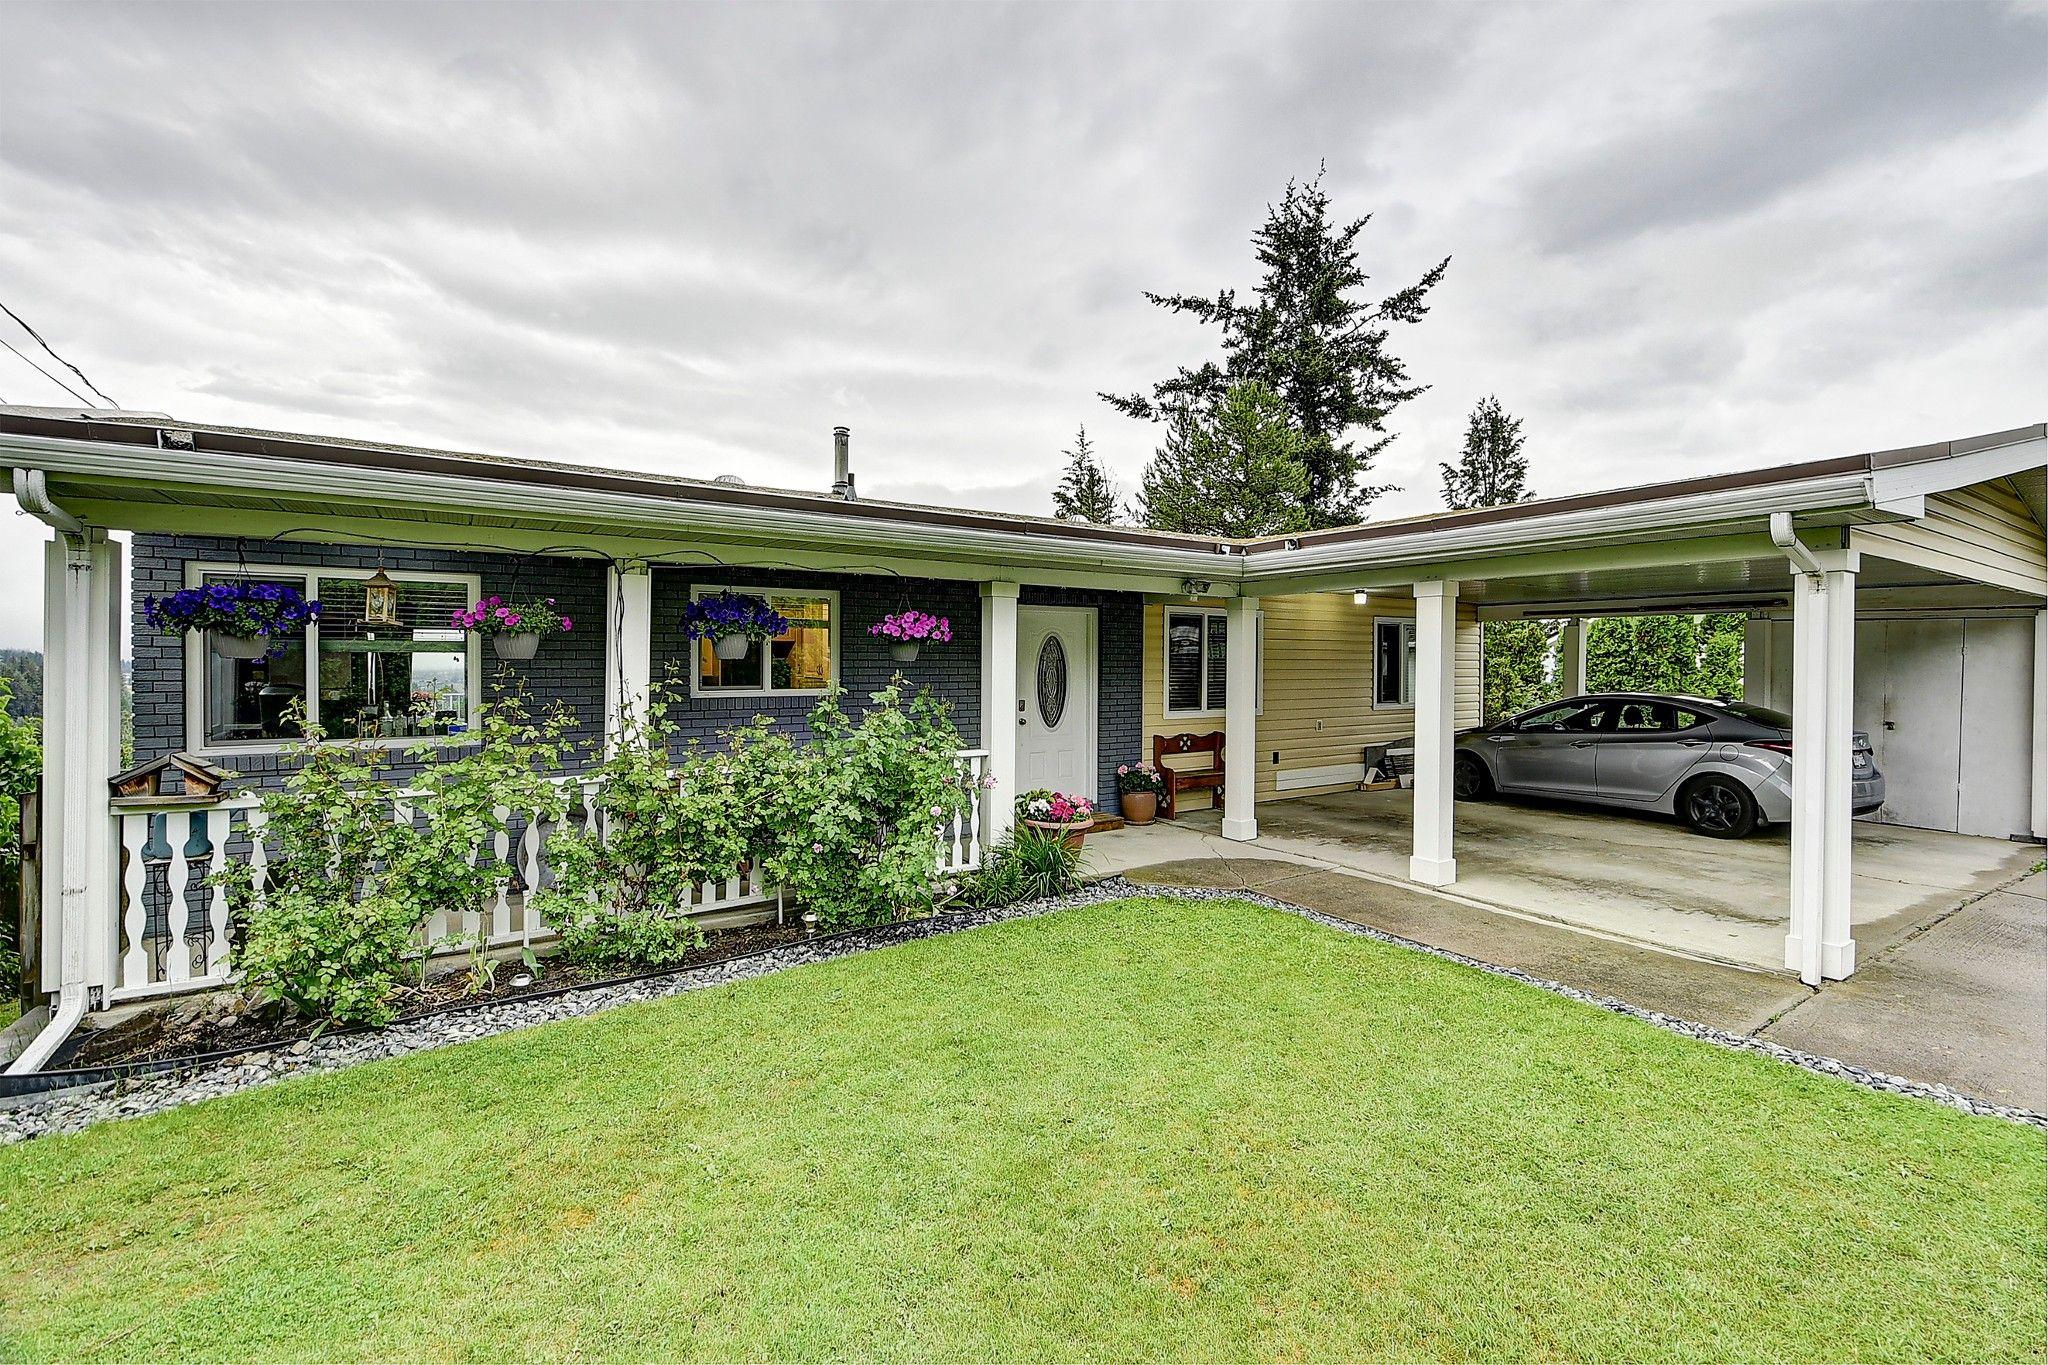 Main Photo: 3289 Mcleod Road in West Kelowna: Glenrosa House for sale (central okanagan)  : MLS®# 10207883